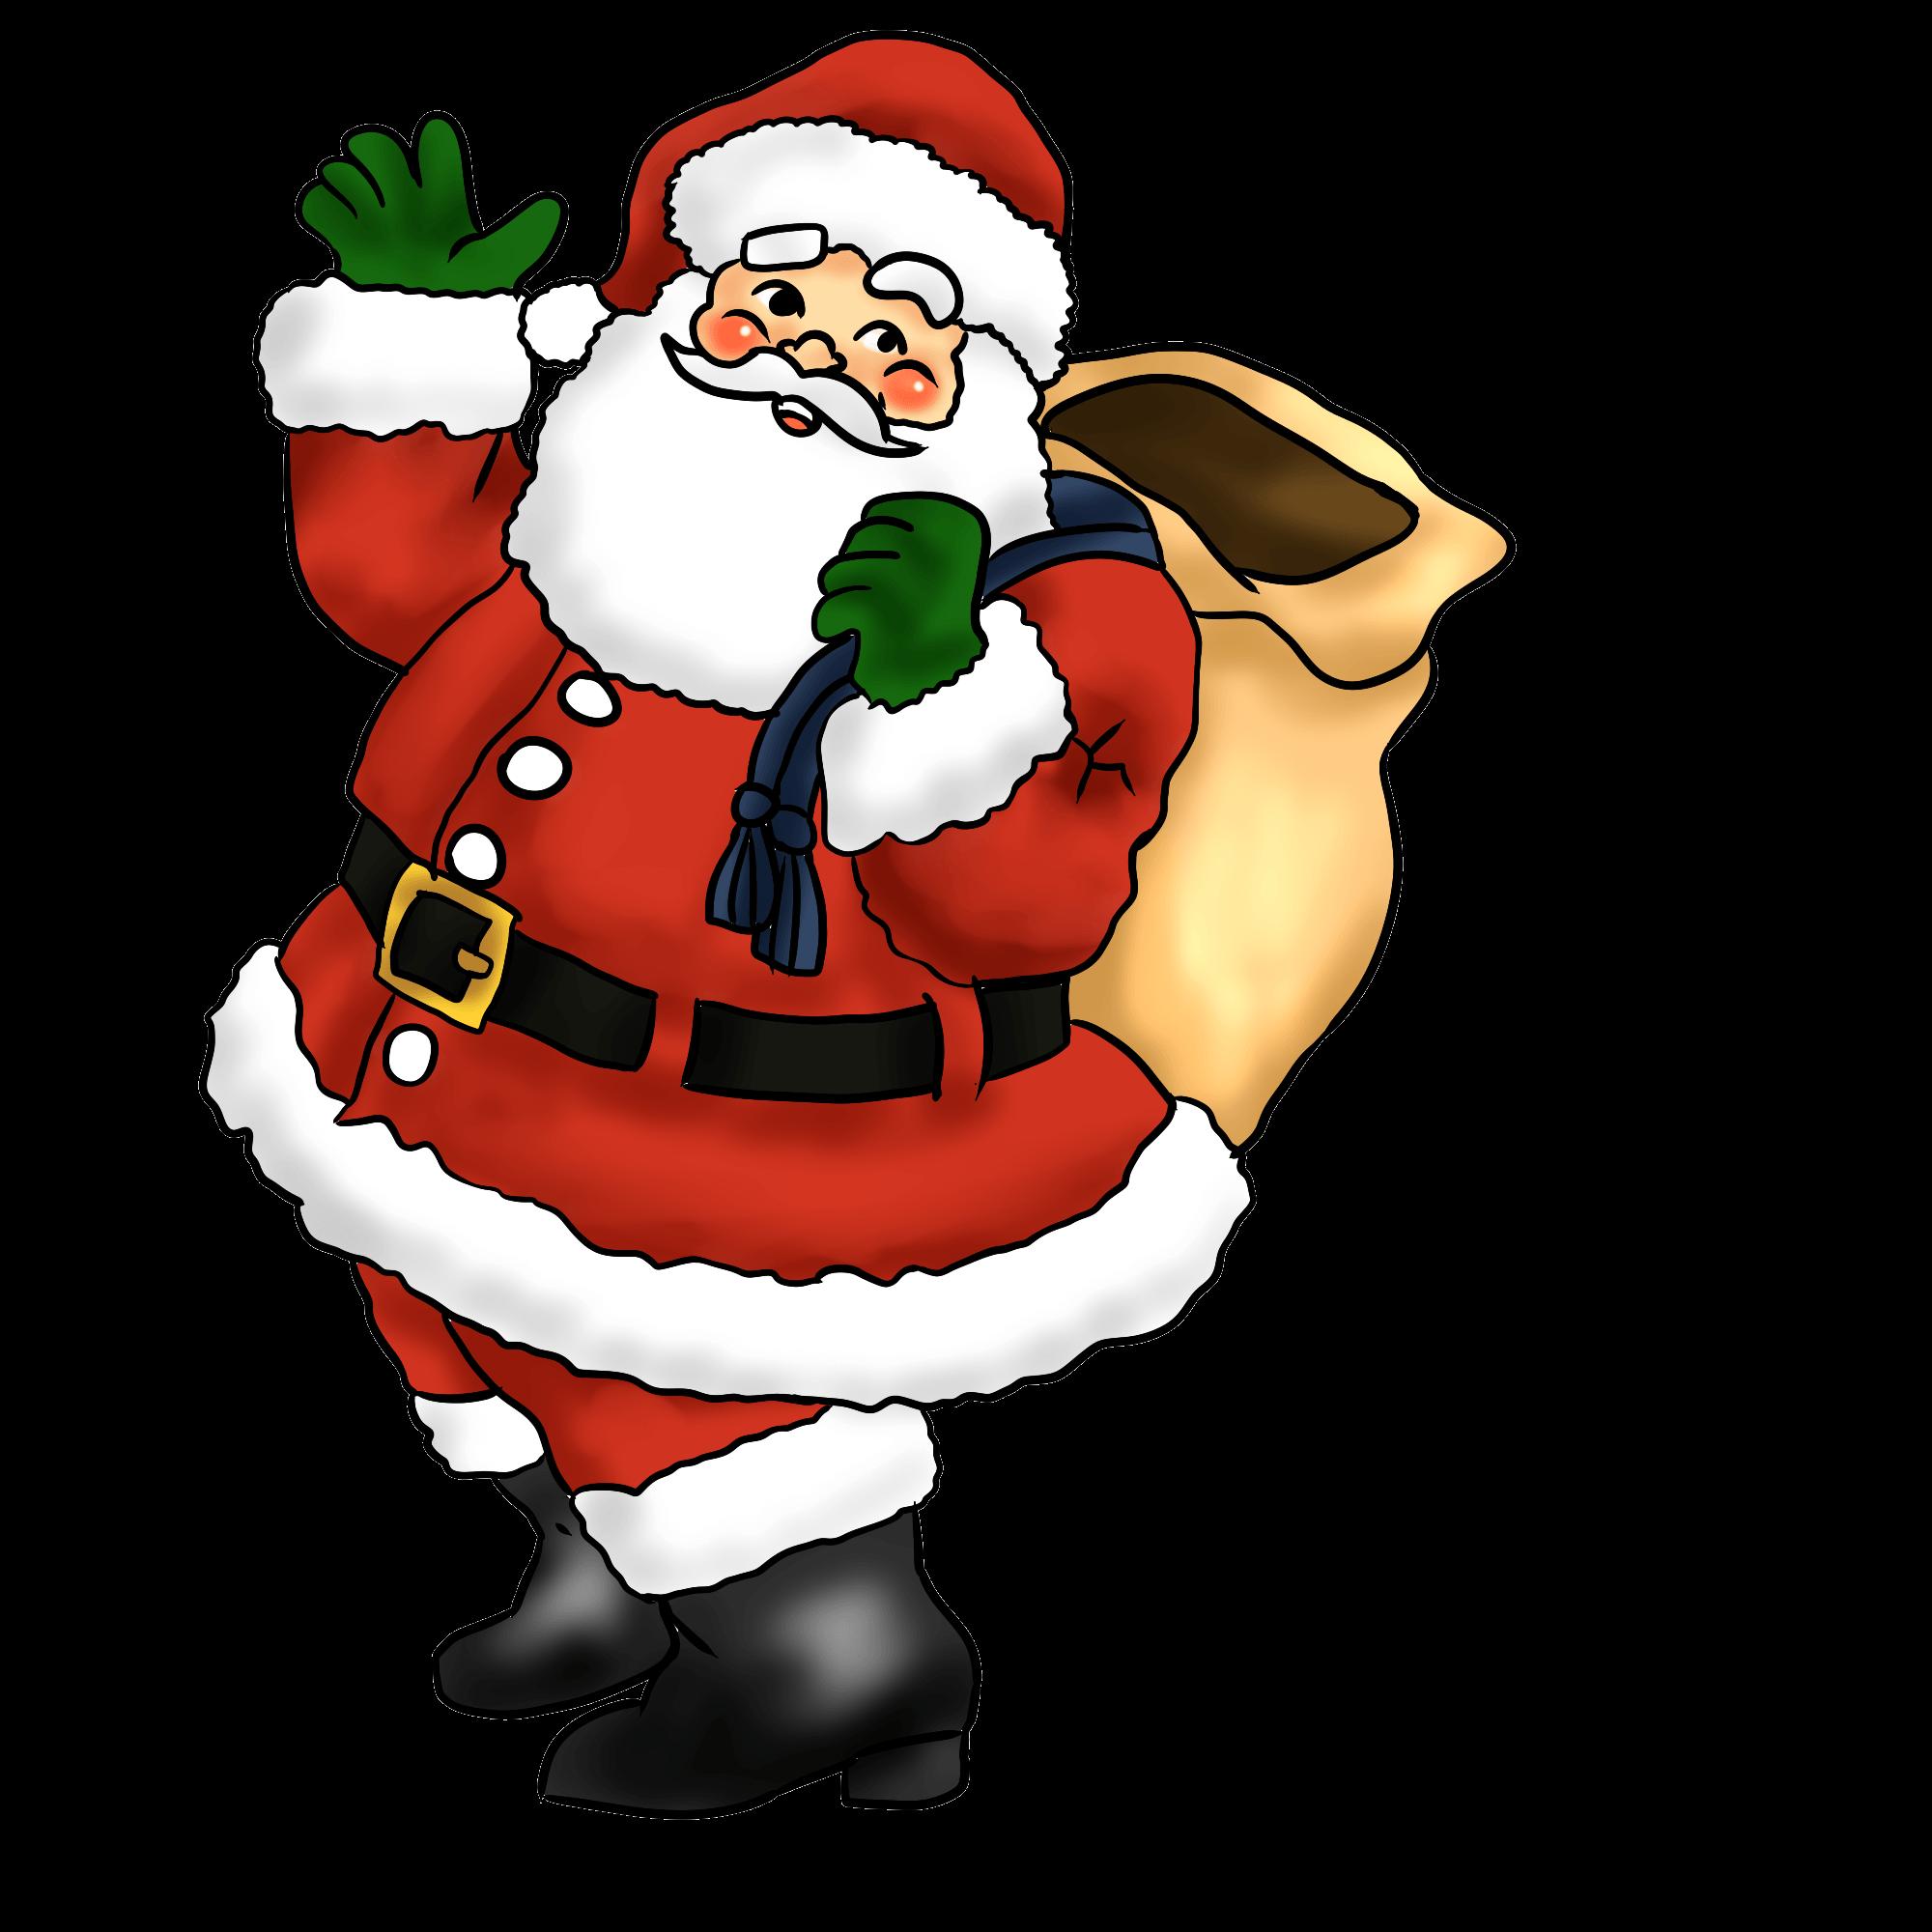 Free Santa Animated Cliparts, Download Free Clip Art, Free Clip Art.